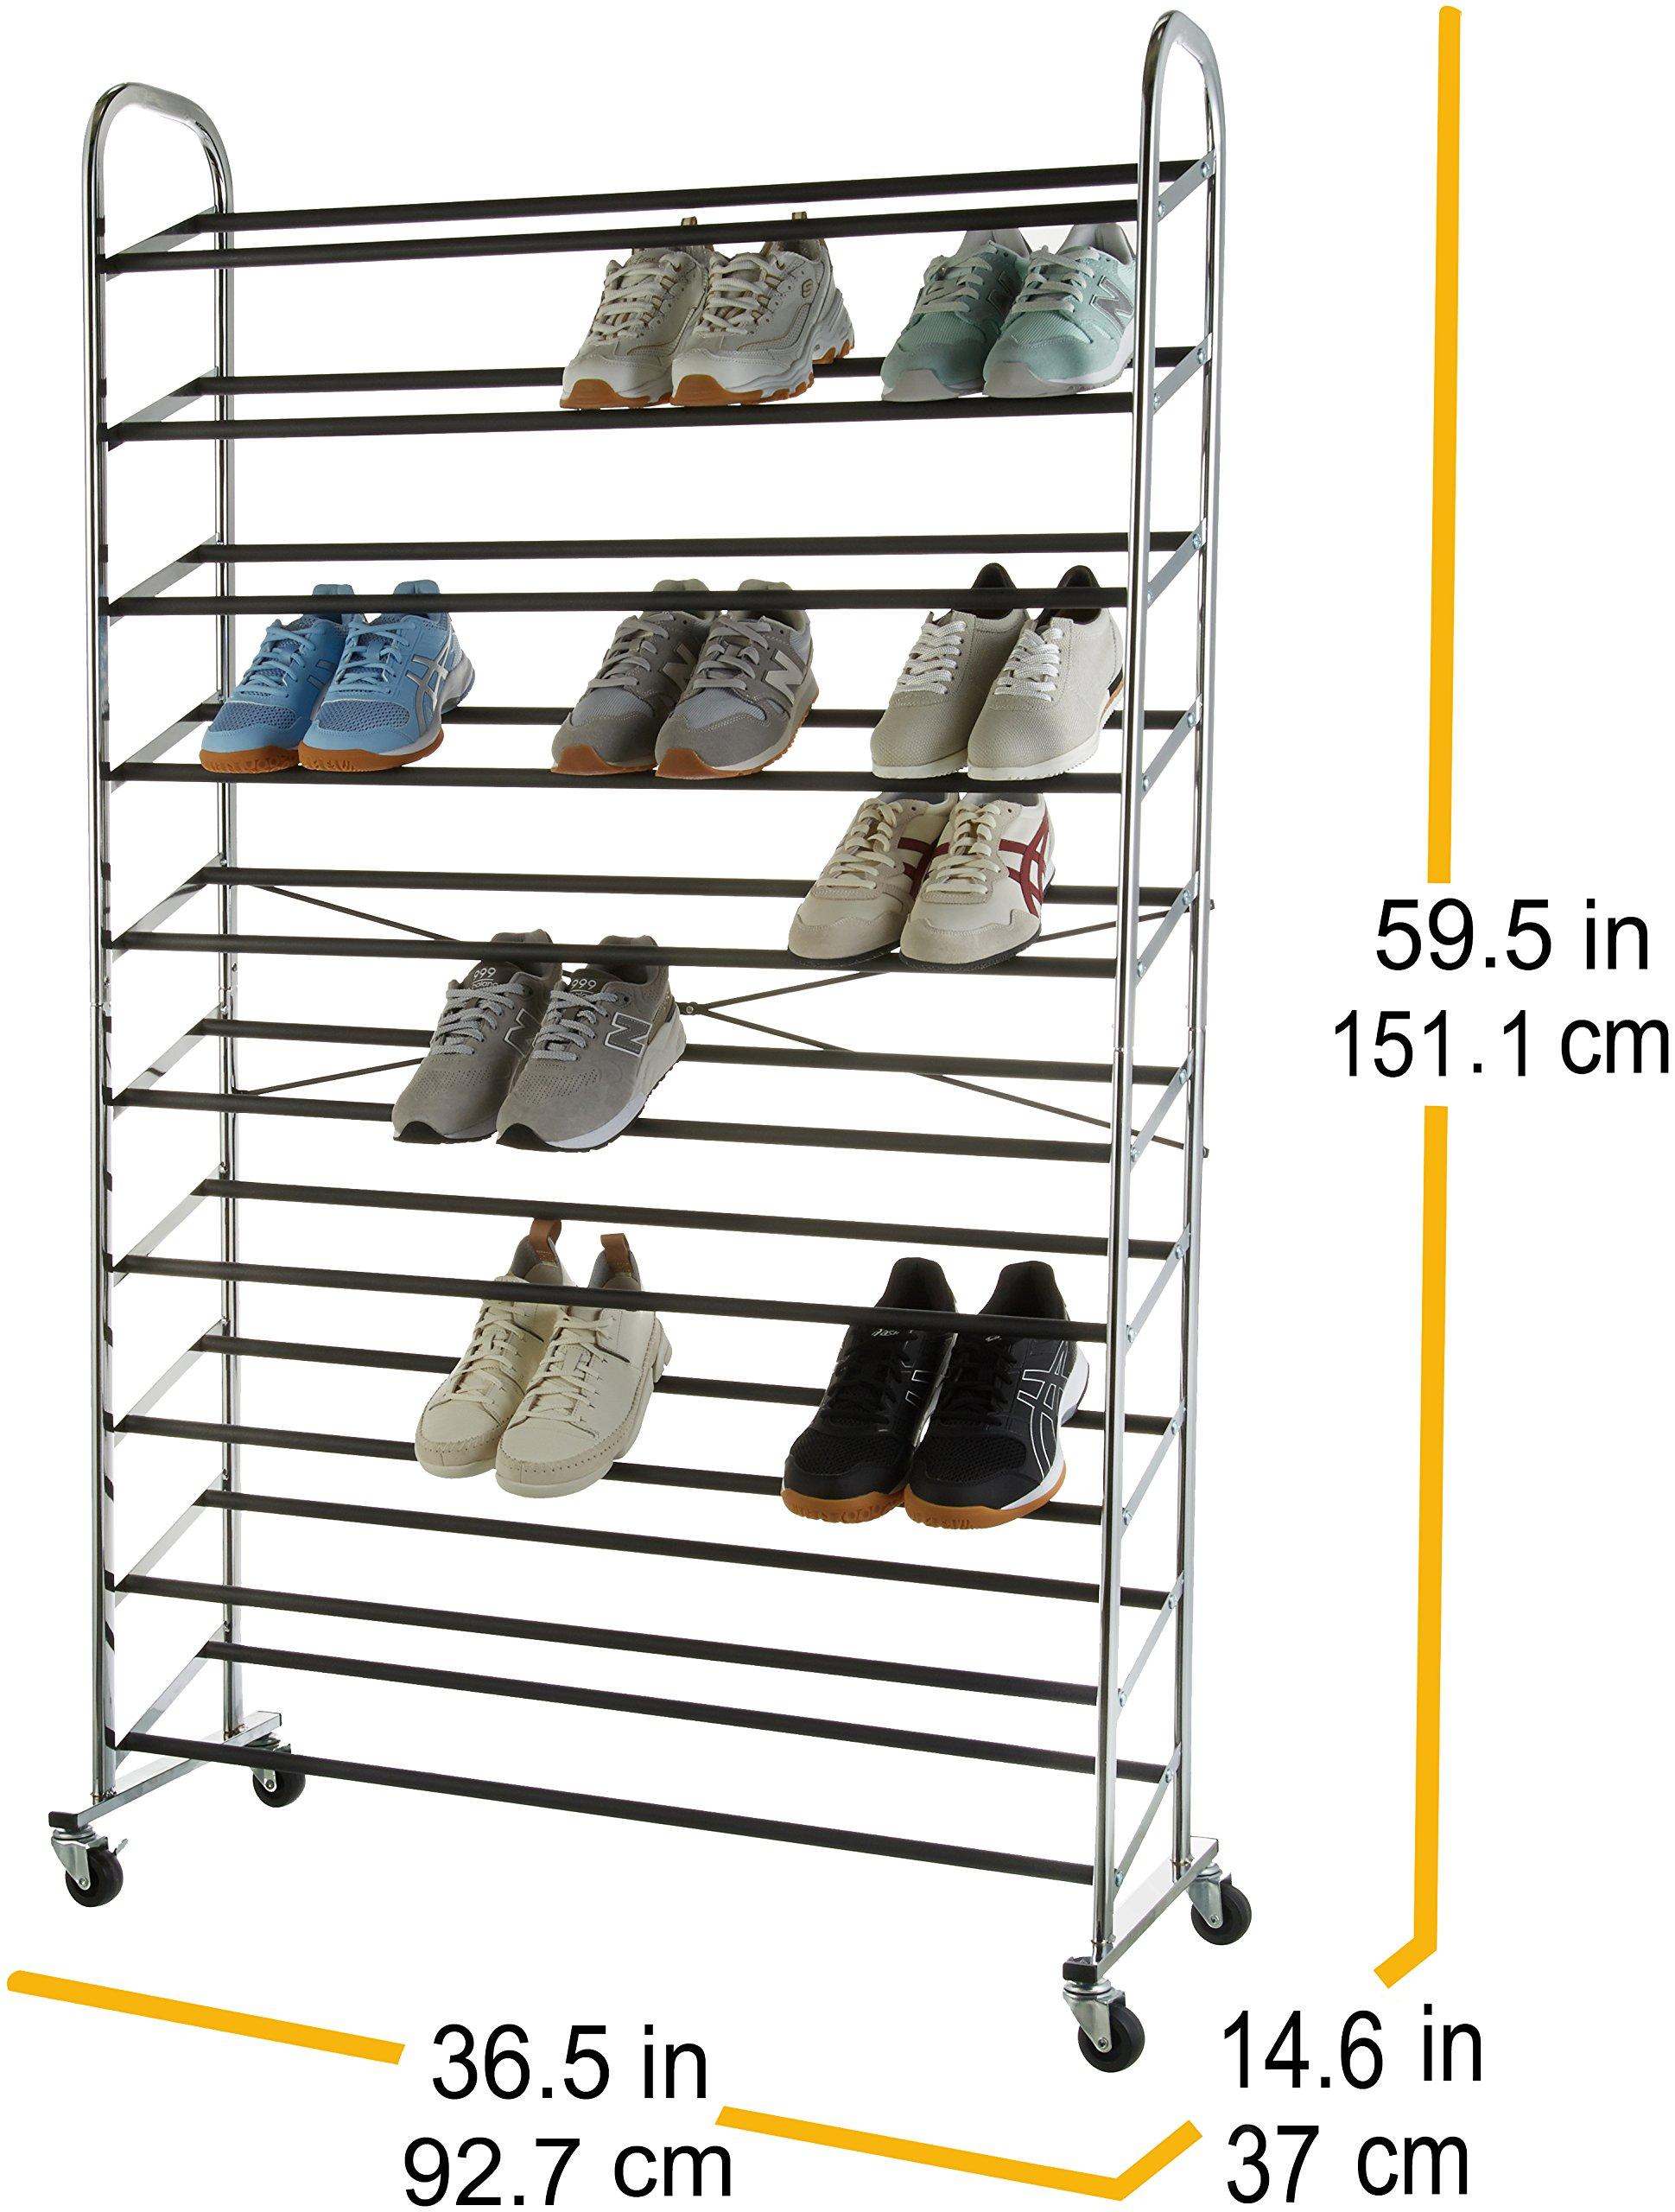 Schuhregal 50 Paar Schuhe.Amazonbasics Schuhregal Für 50 Paar Schuhe